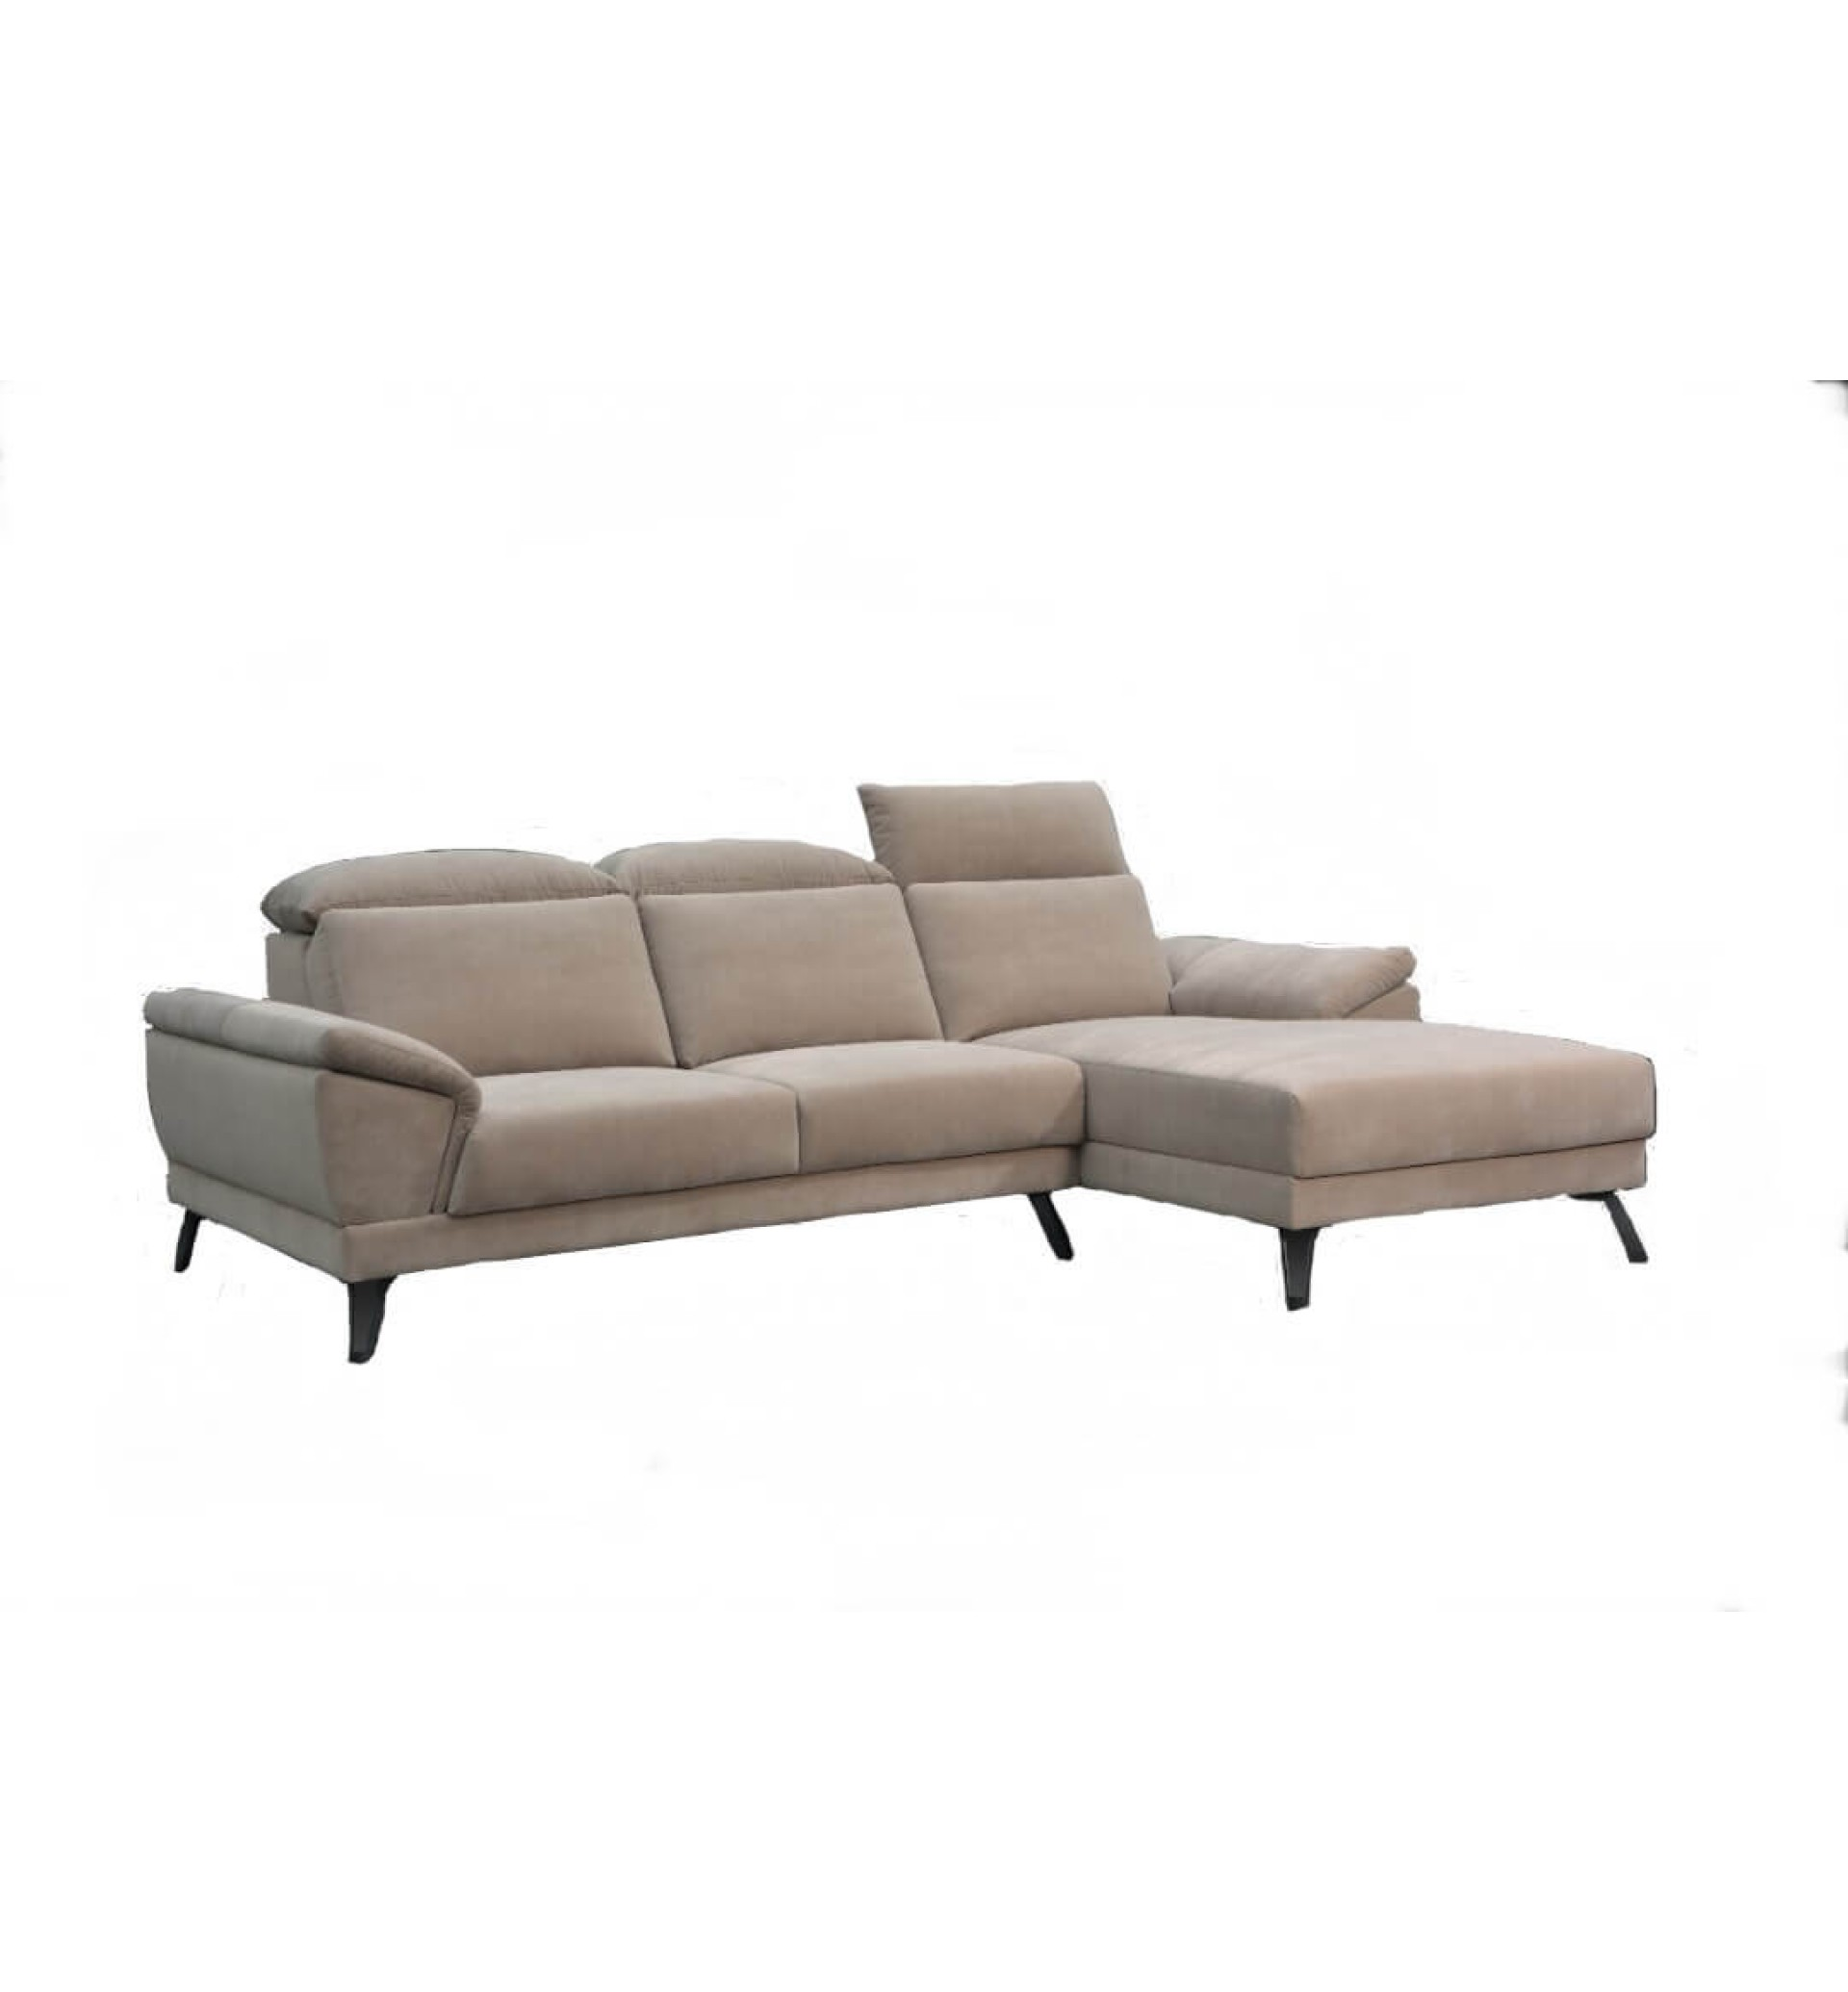 Laveo Jordan L-Shaped Sofa